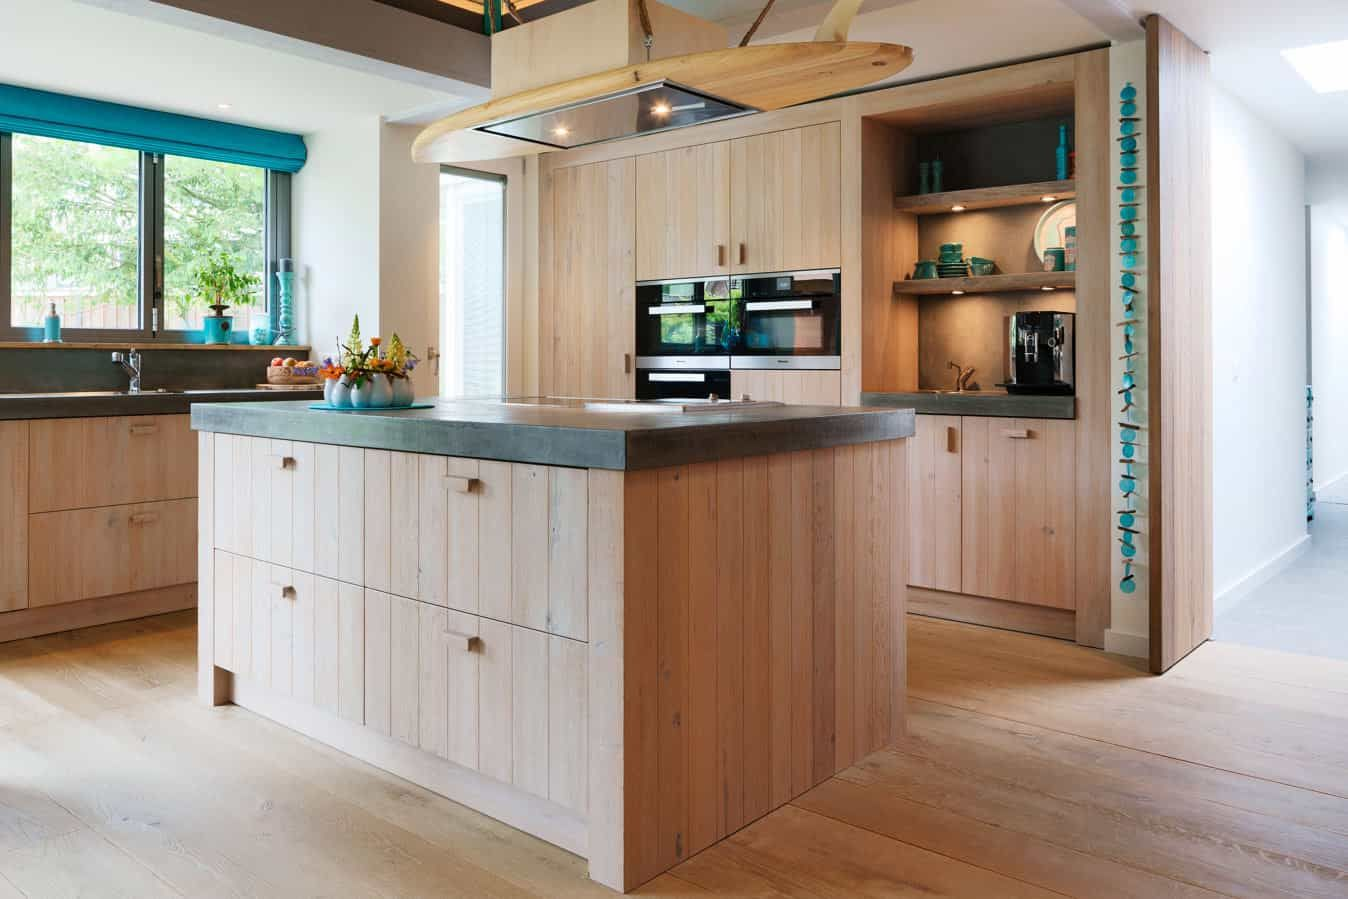 Massief Houten Keuken : Massief houten keuken met betonnen aanrecht keuken in